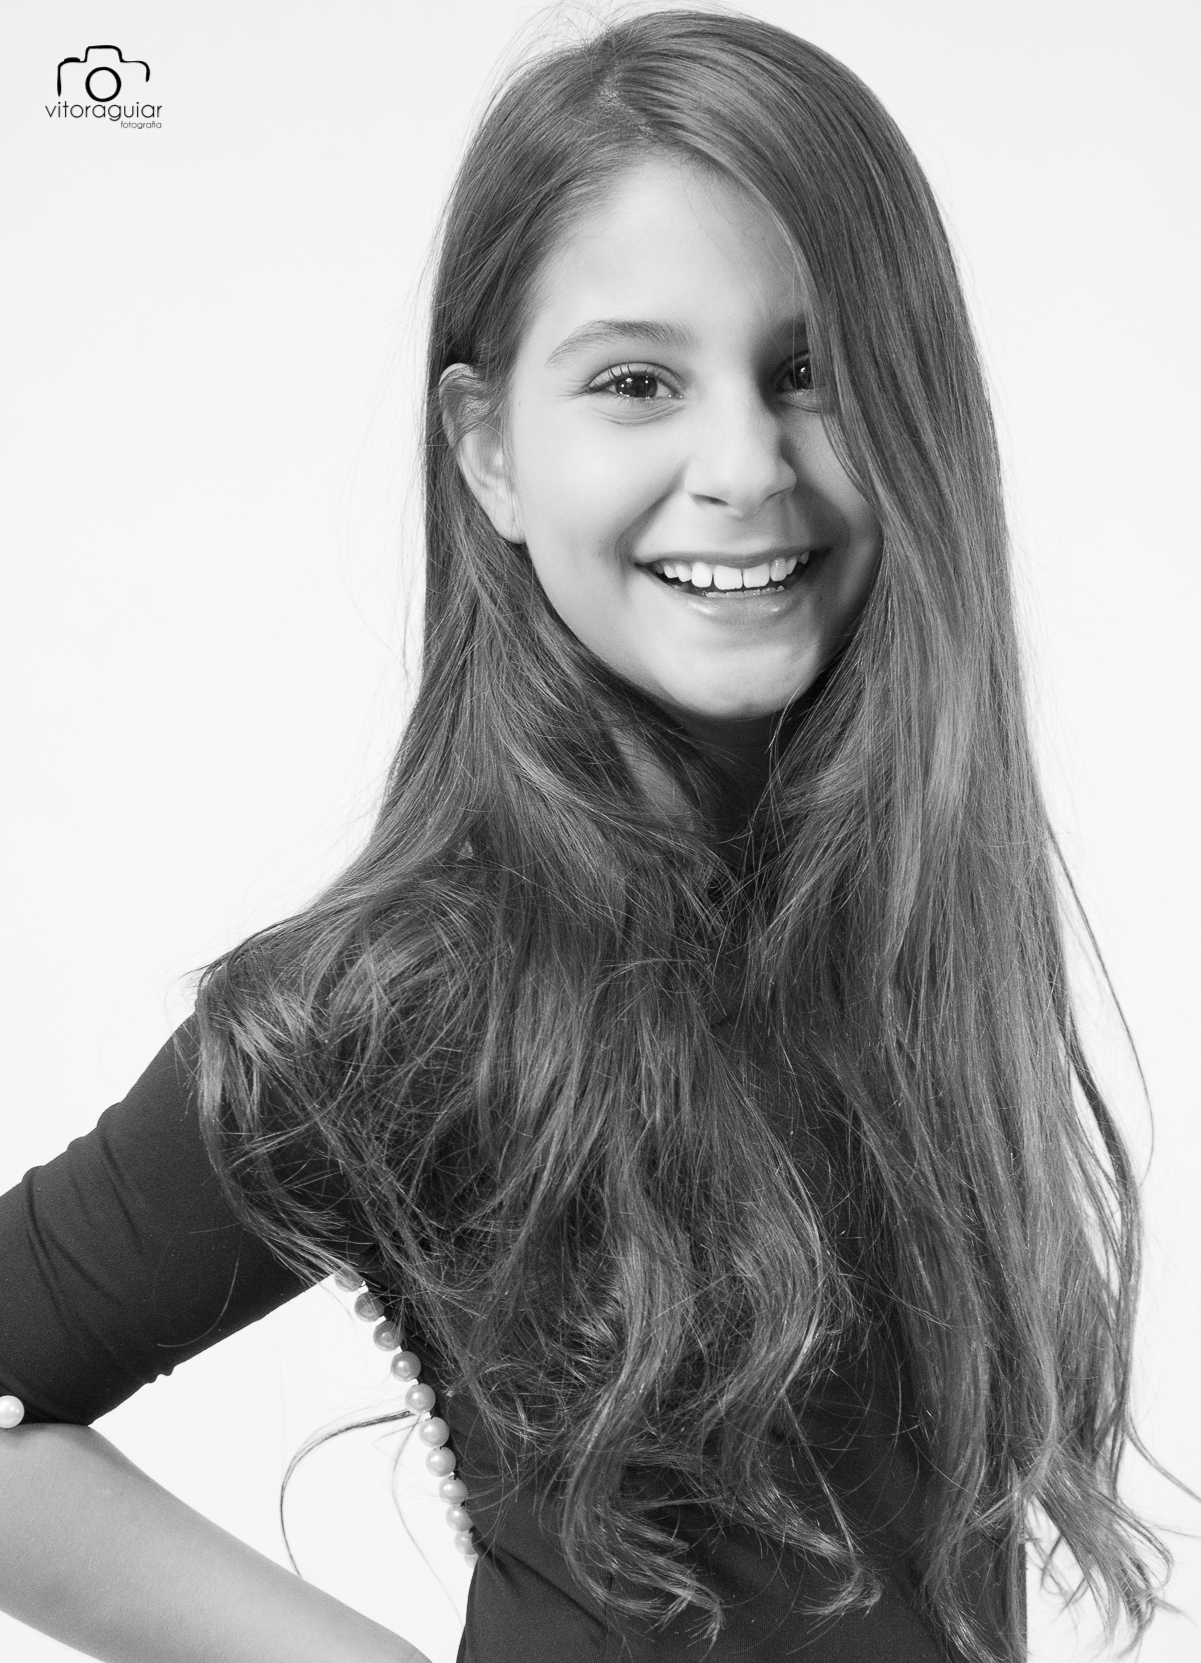 isabella_koppel-81